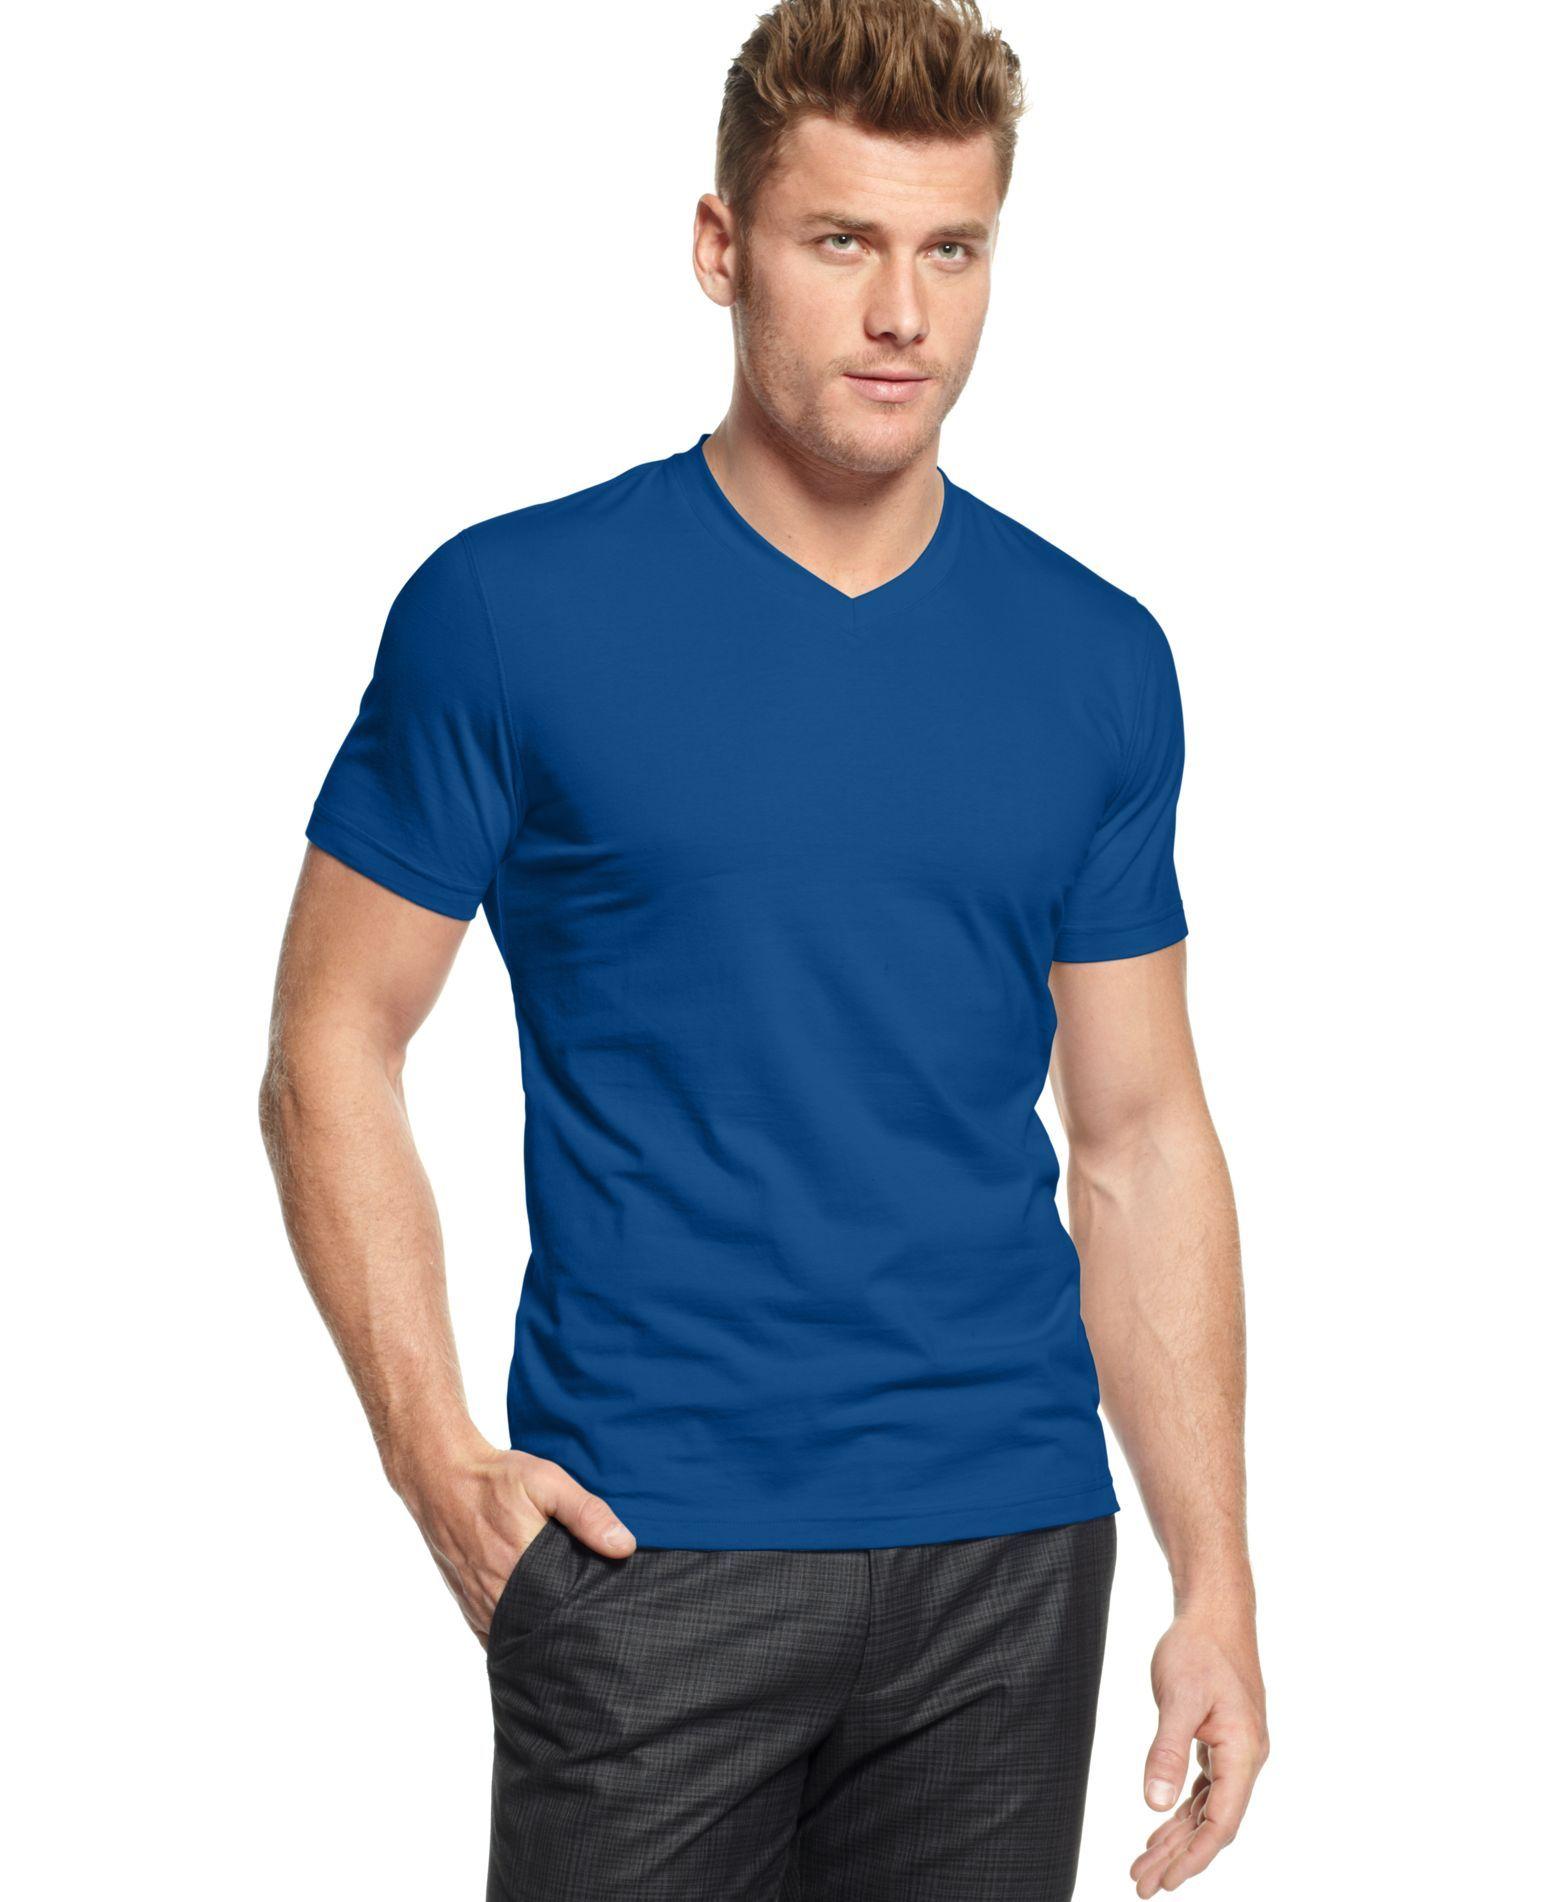 3e771850b079f Alfani Big and Tall T-Shirt, Stretch V Neck Tee   Products   Pinterest